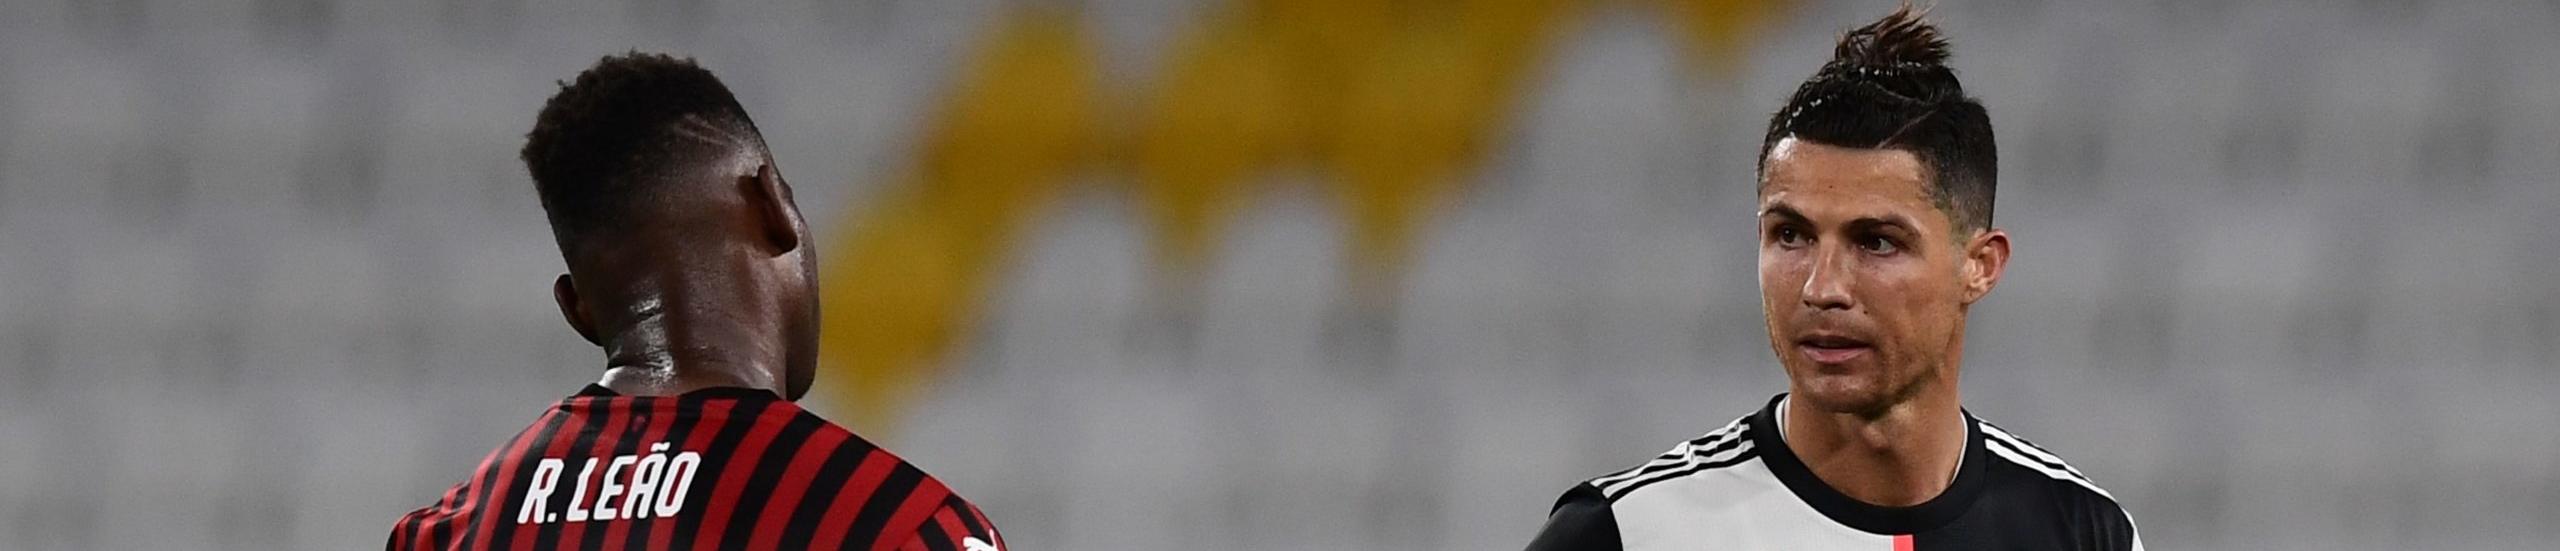 Pronostico Milan-Juventus: il Diavolo perde i pezzi, Pirlo deve inventarsi la difesa - le ultimissime